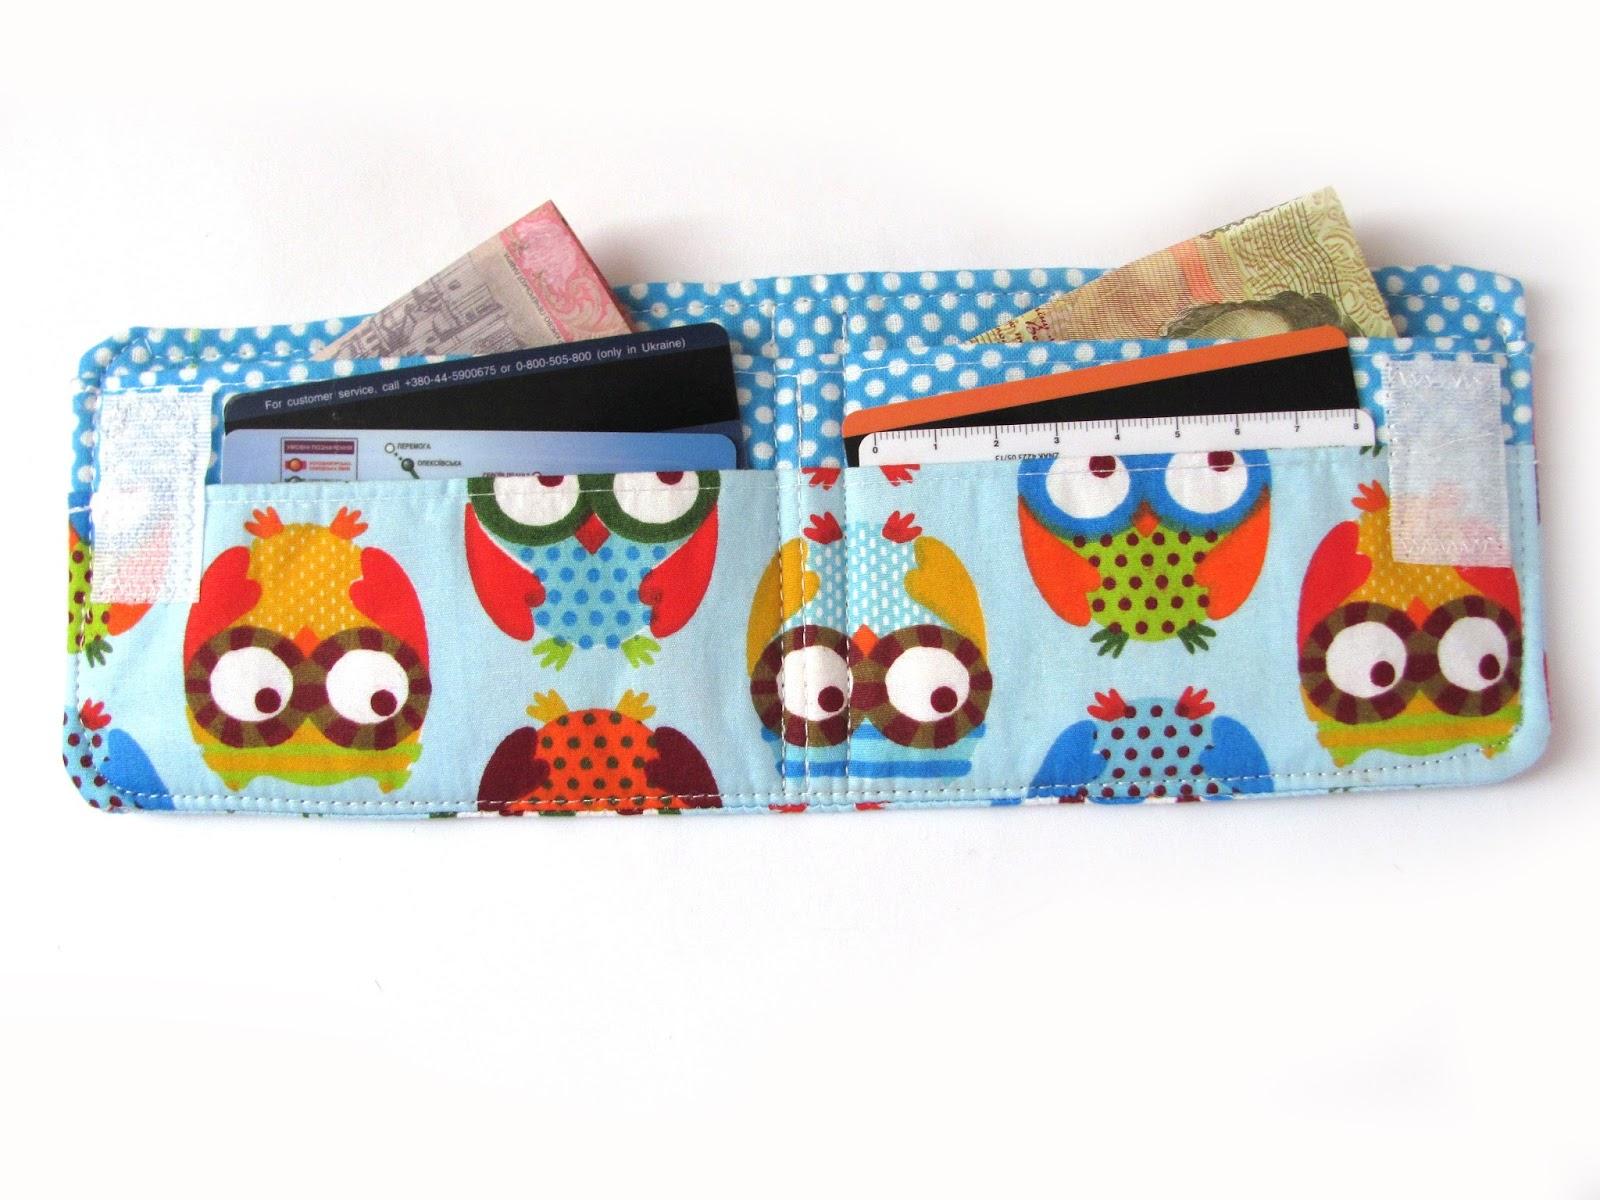 кошелек своими руками.  Bright purse. Sewing instructions